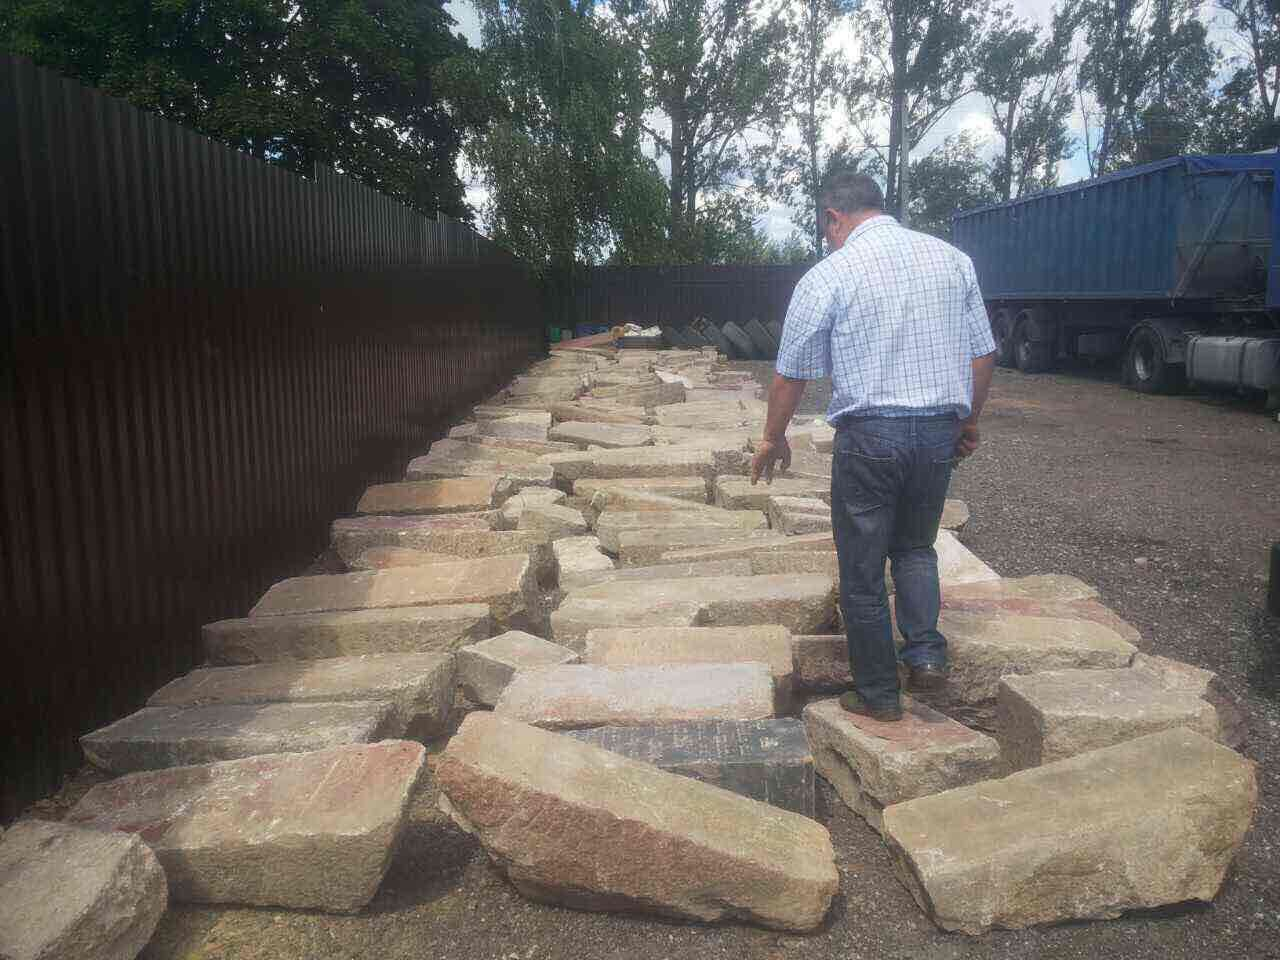 Slutsk Jewish headstones moved to safe location